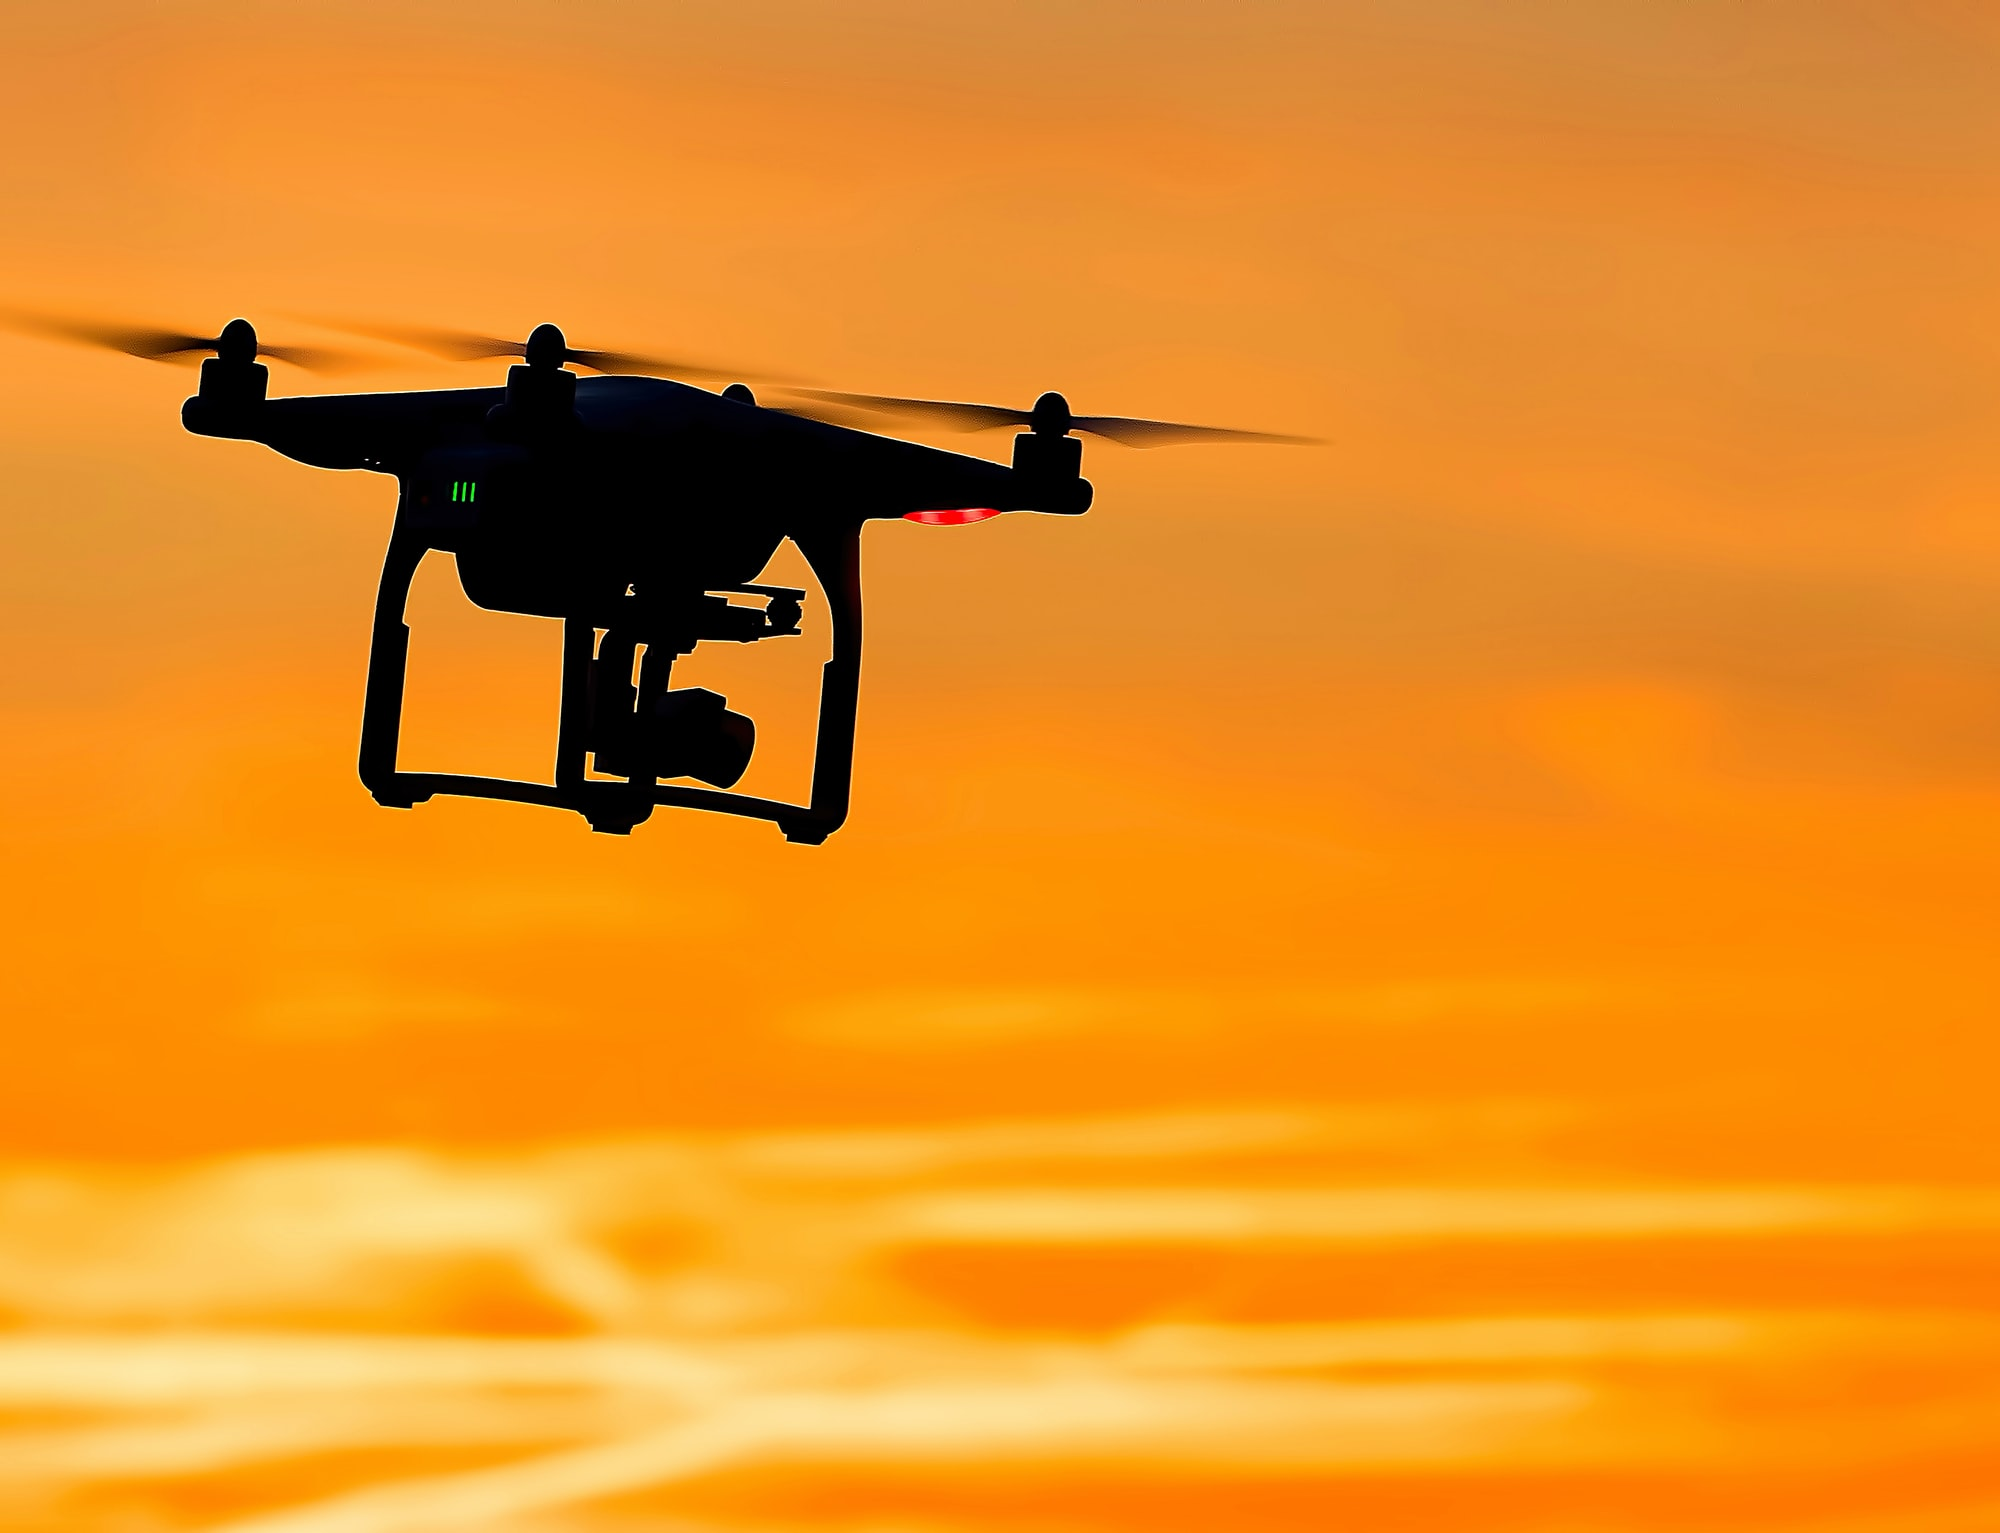 New Era of RPVs UMAs & Drones (Replugged)